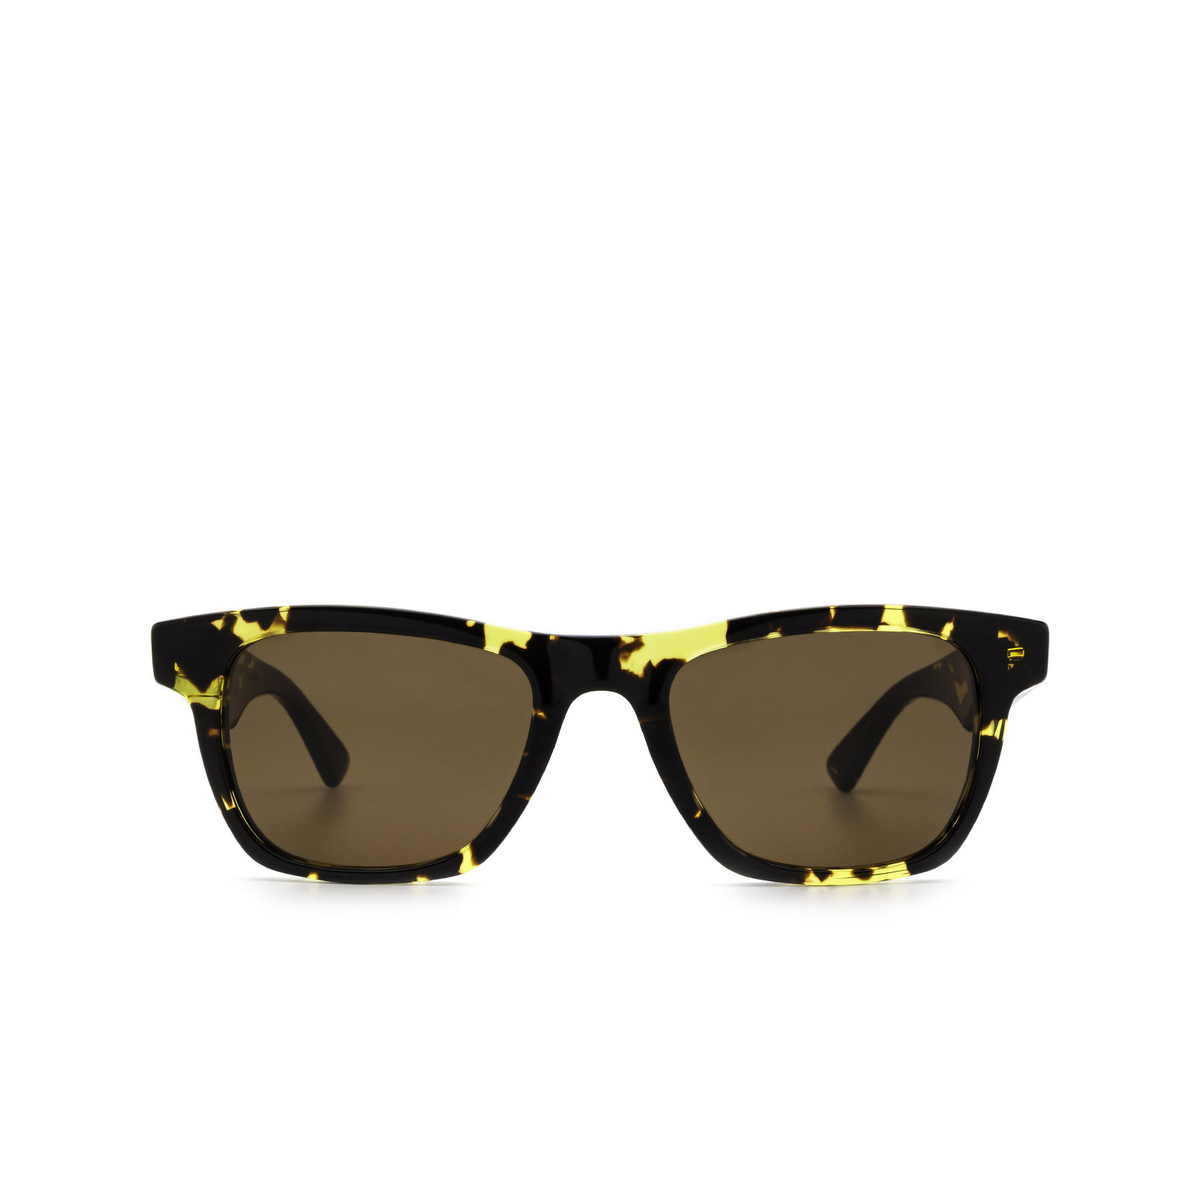 Bottega Veneta® Square Sunglasses: BV1120S color Havana 002 - front view.